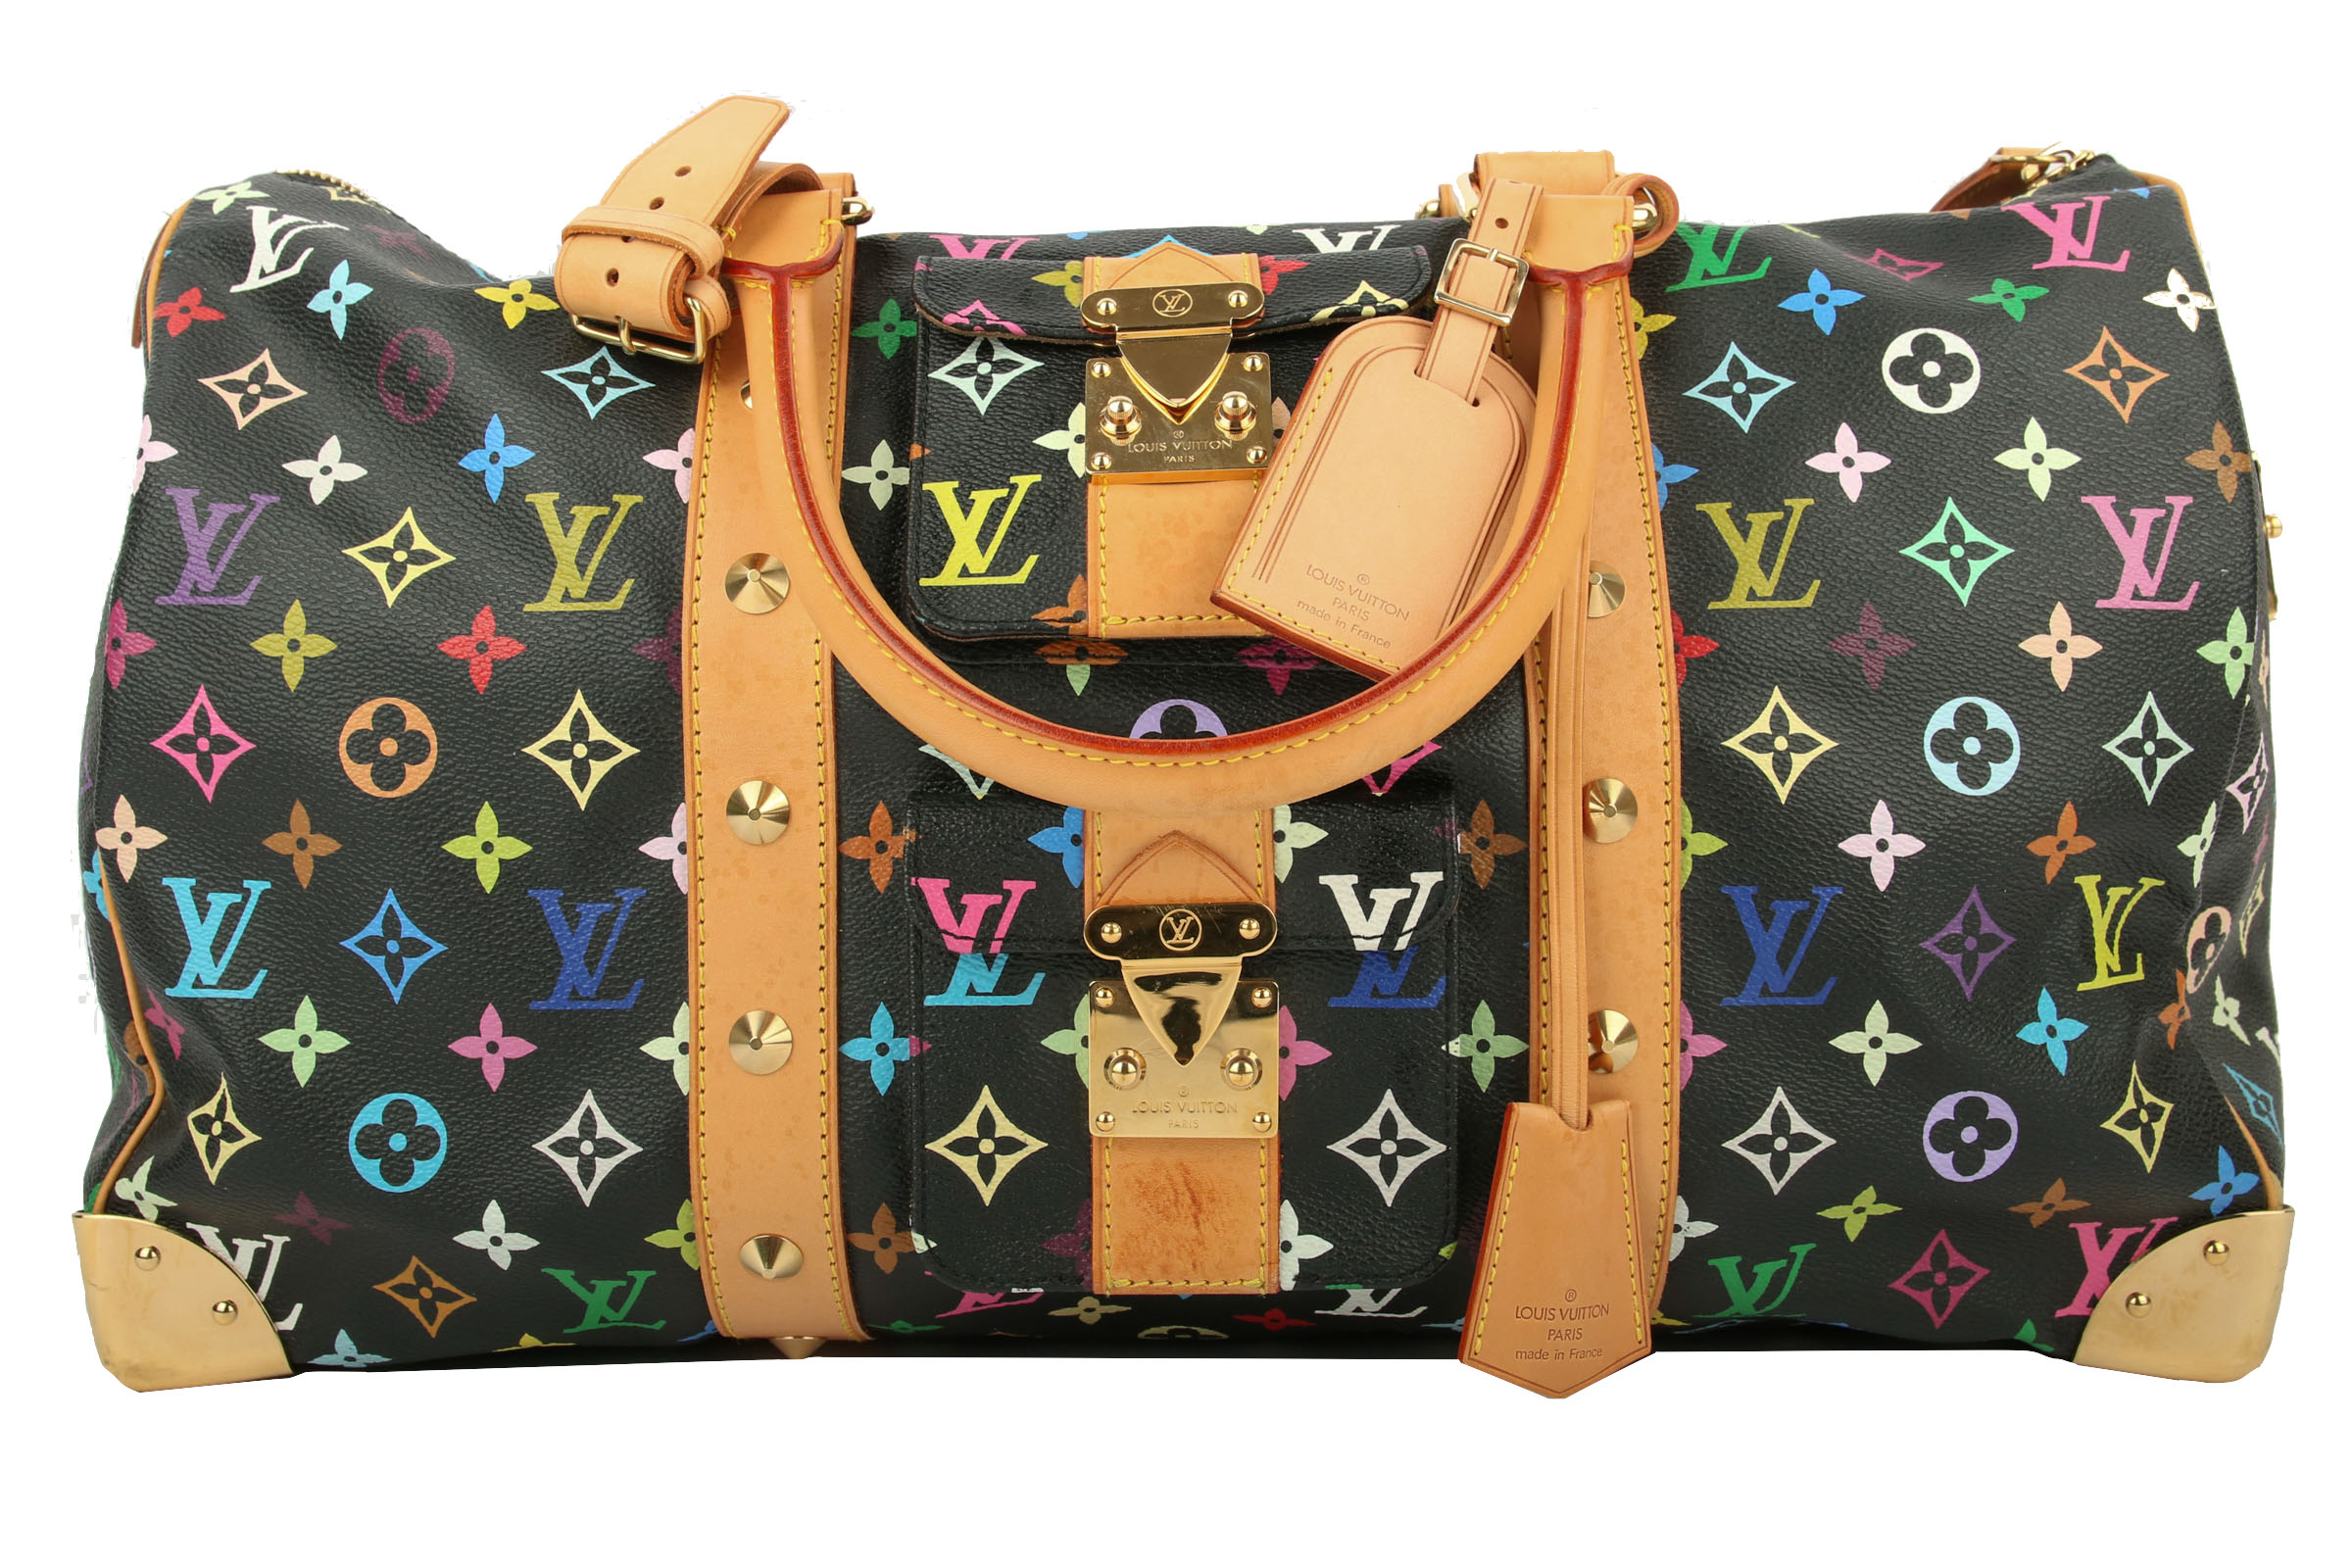 d503917fb8fb3 Louis Vuitton Keepall 45 Monogram Multicolor